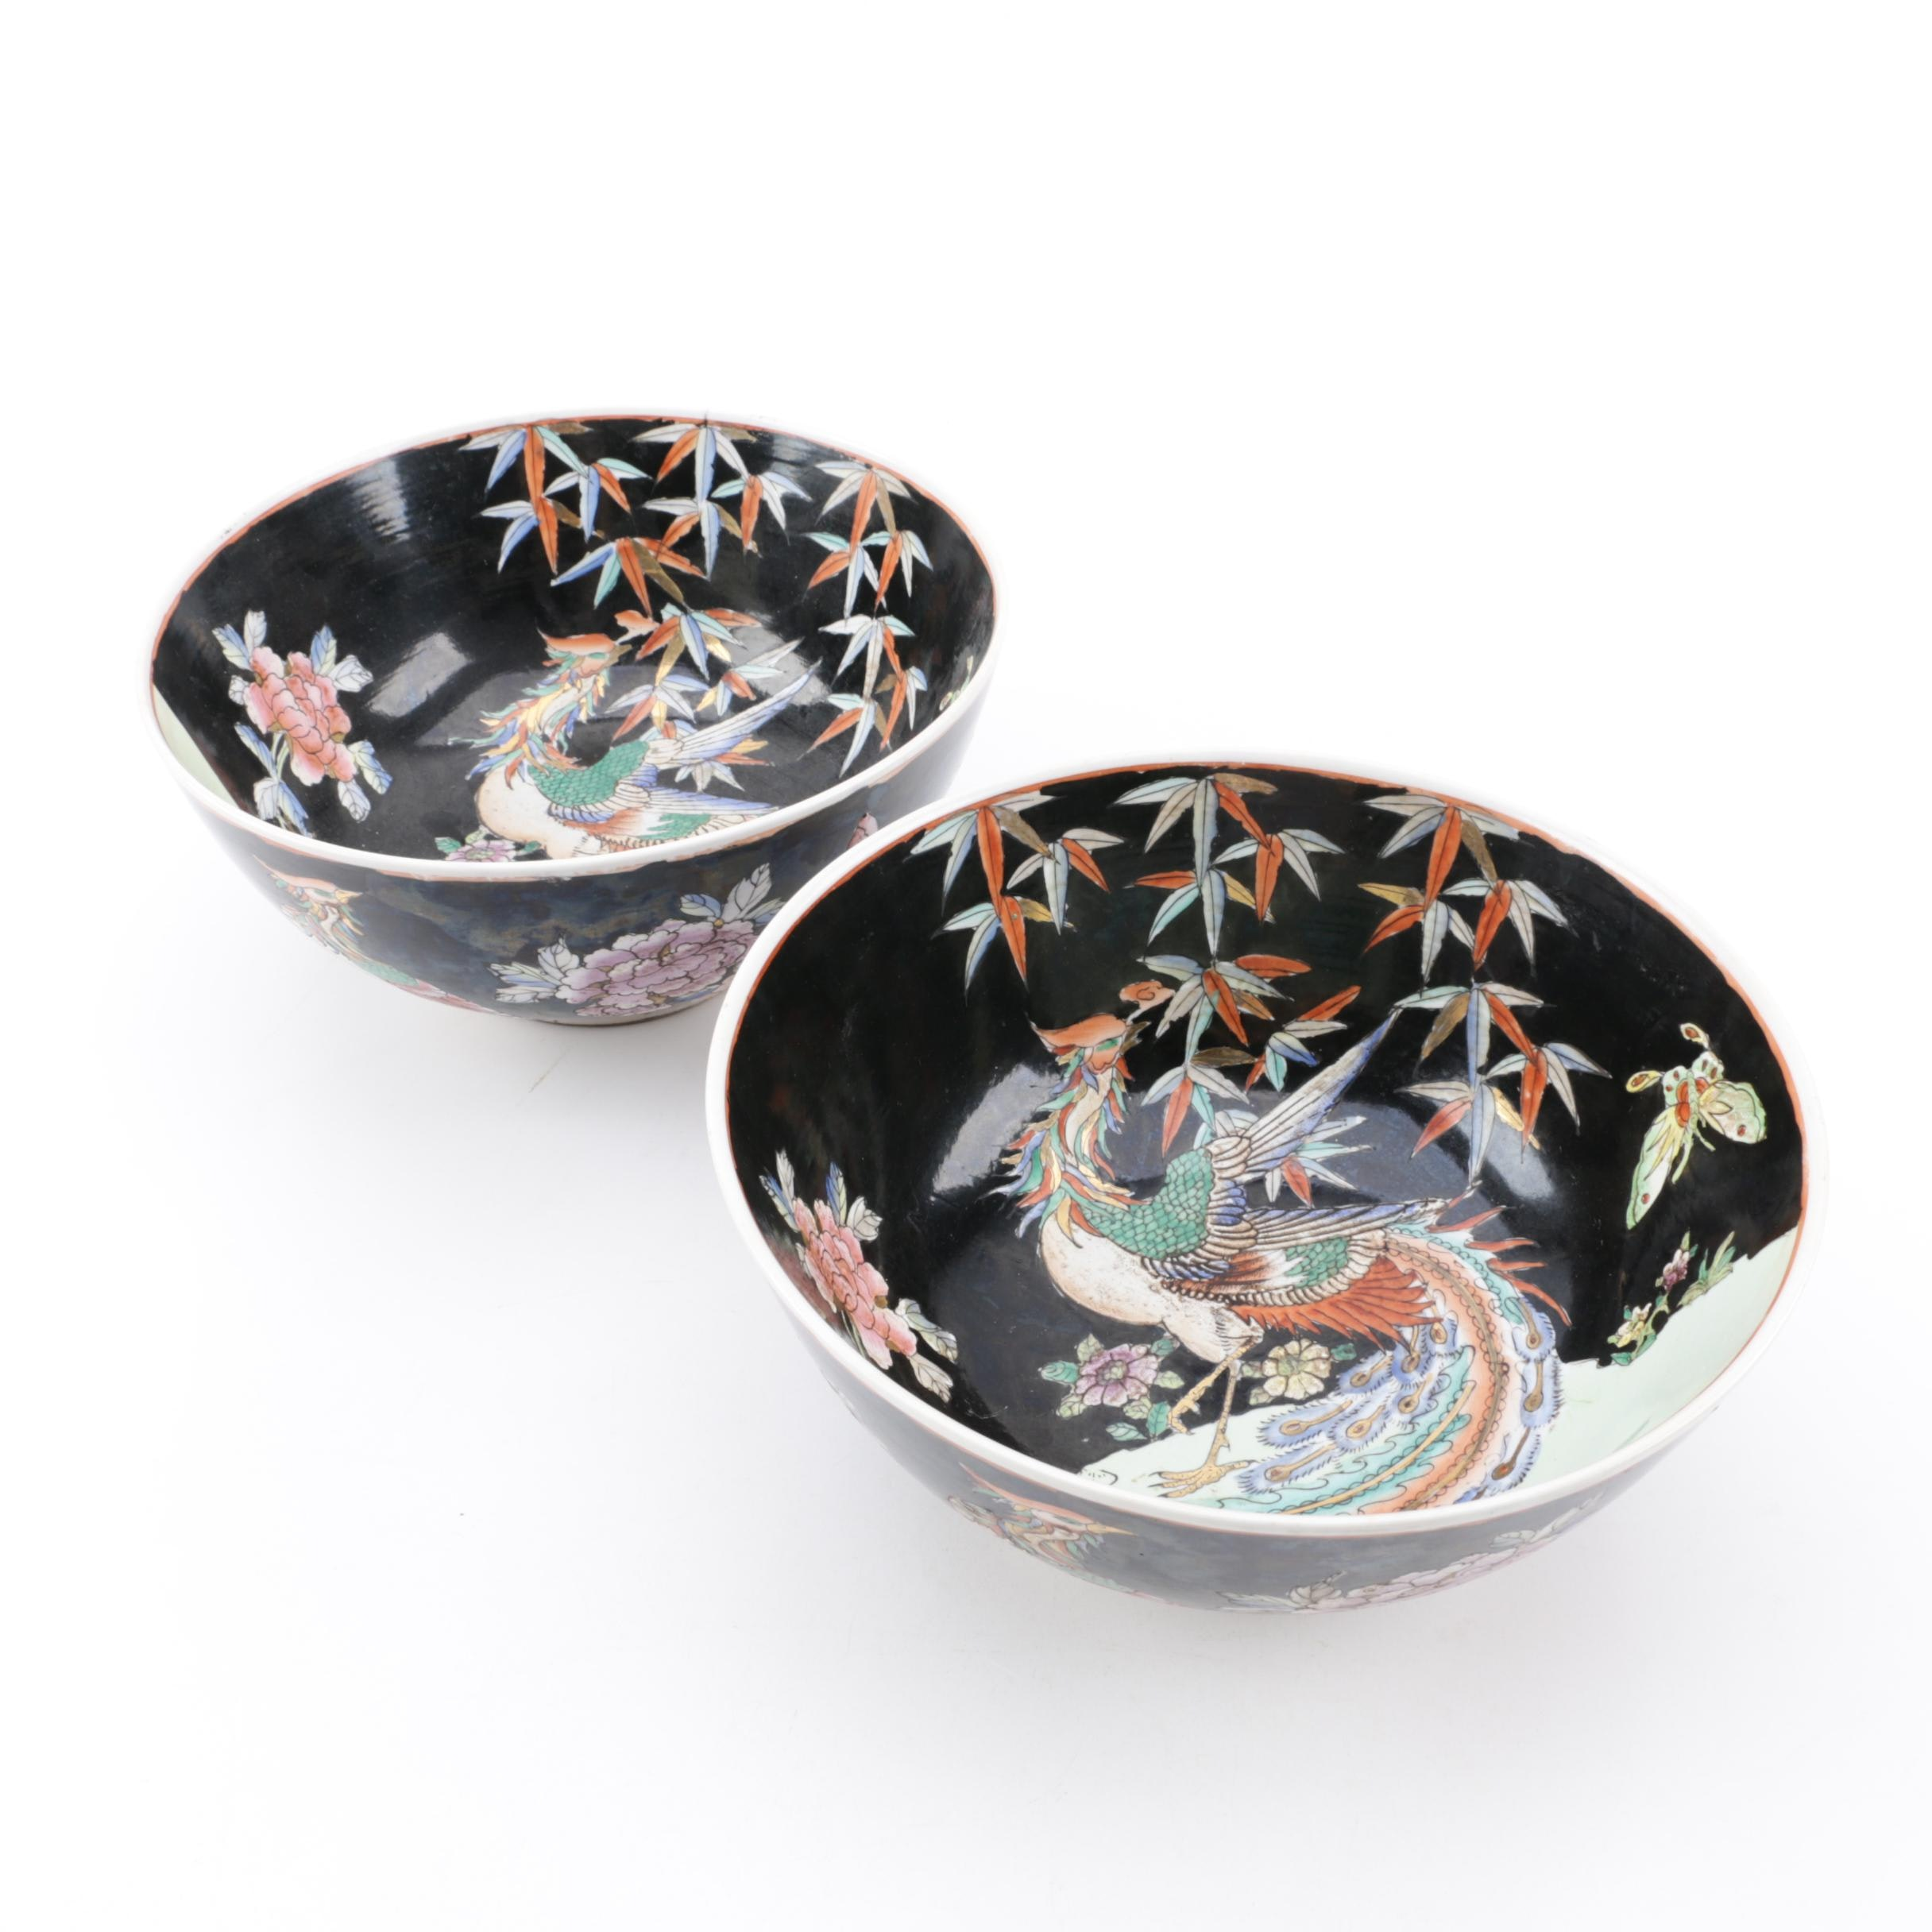 Vintage Chinese Famille Noir Style Porcelain Bowls